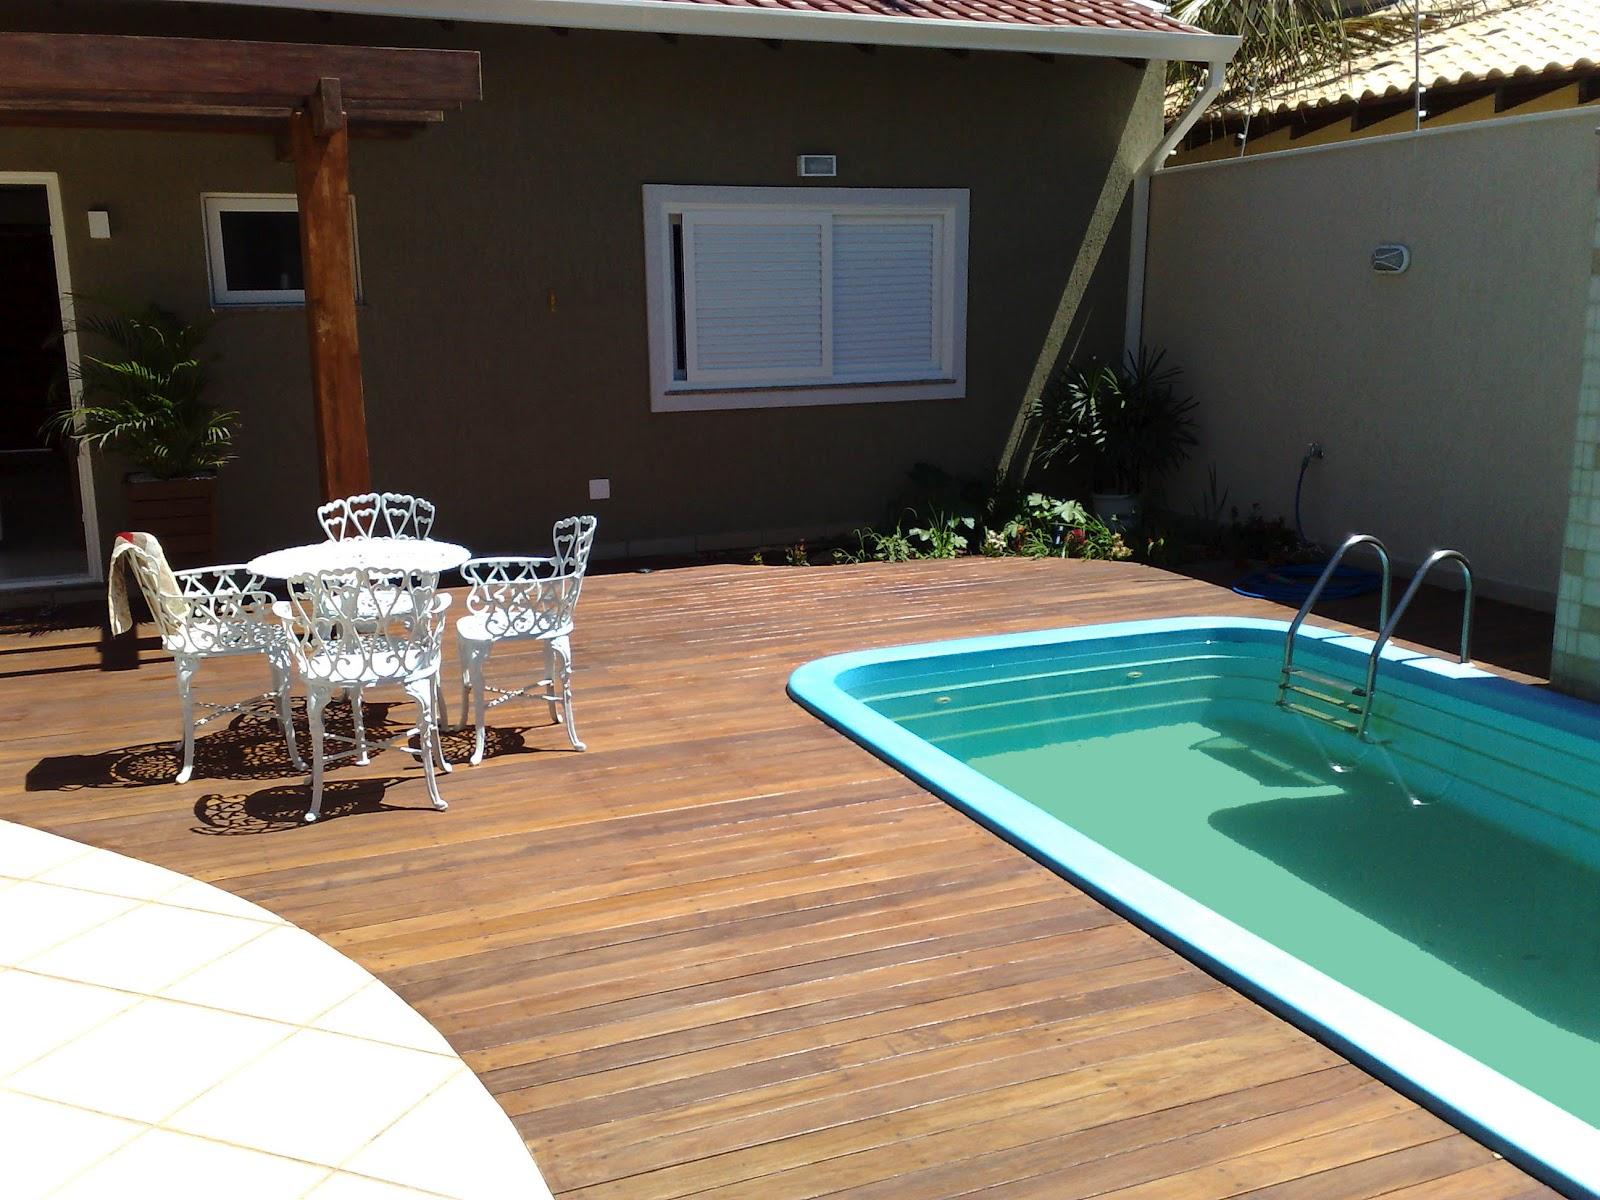 Deck Para Piscina Em Joinville Deck Para Piscina